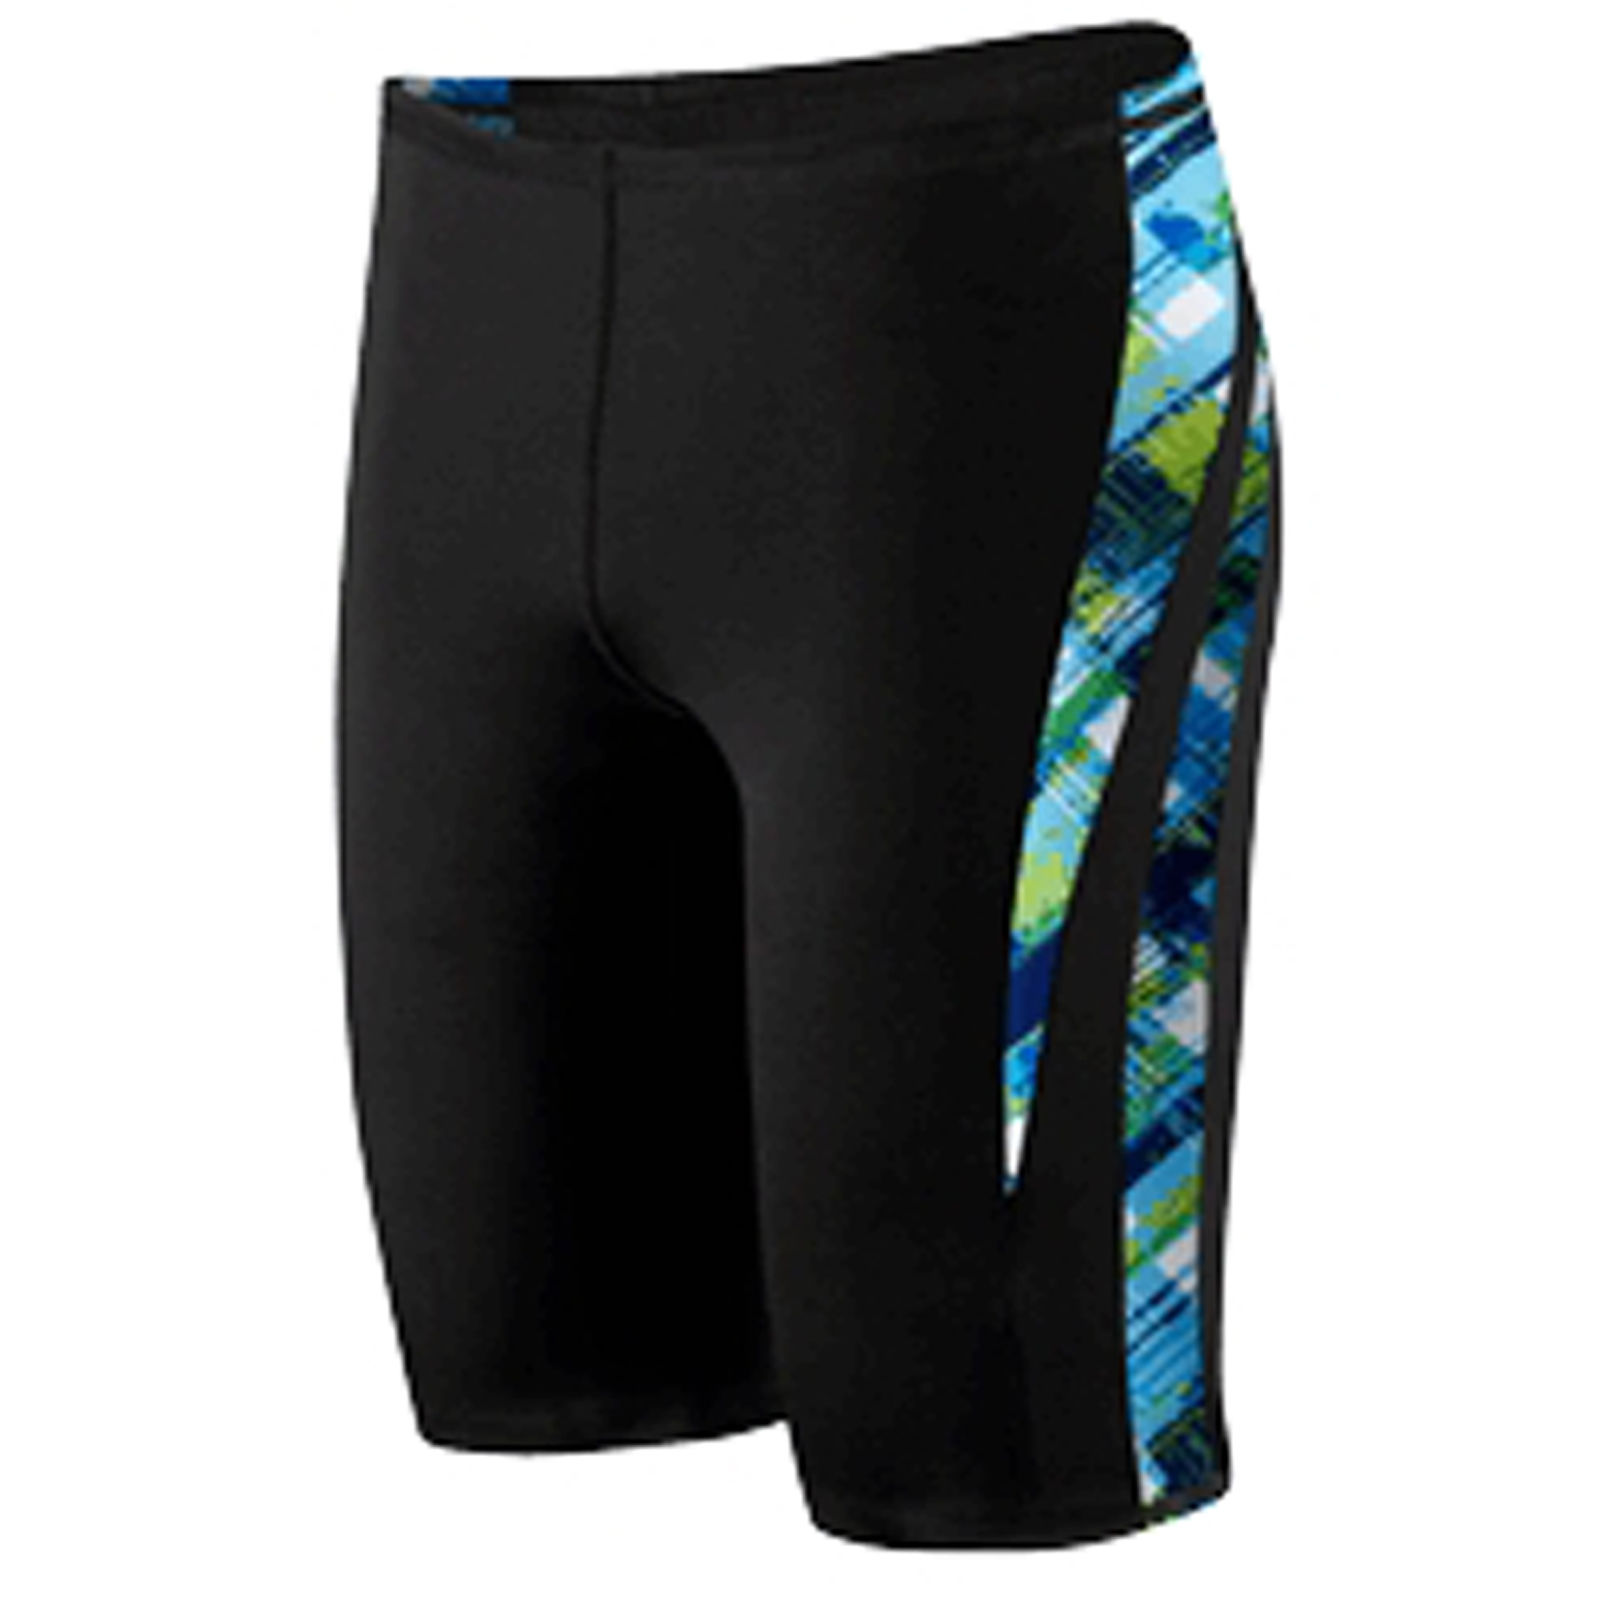 New Speedo Men's Boy's Plaid Spliced Swimsuit Trunk Jammer 8051362